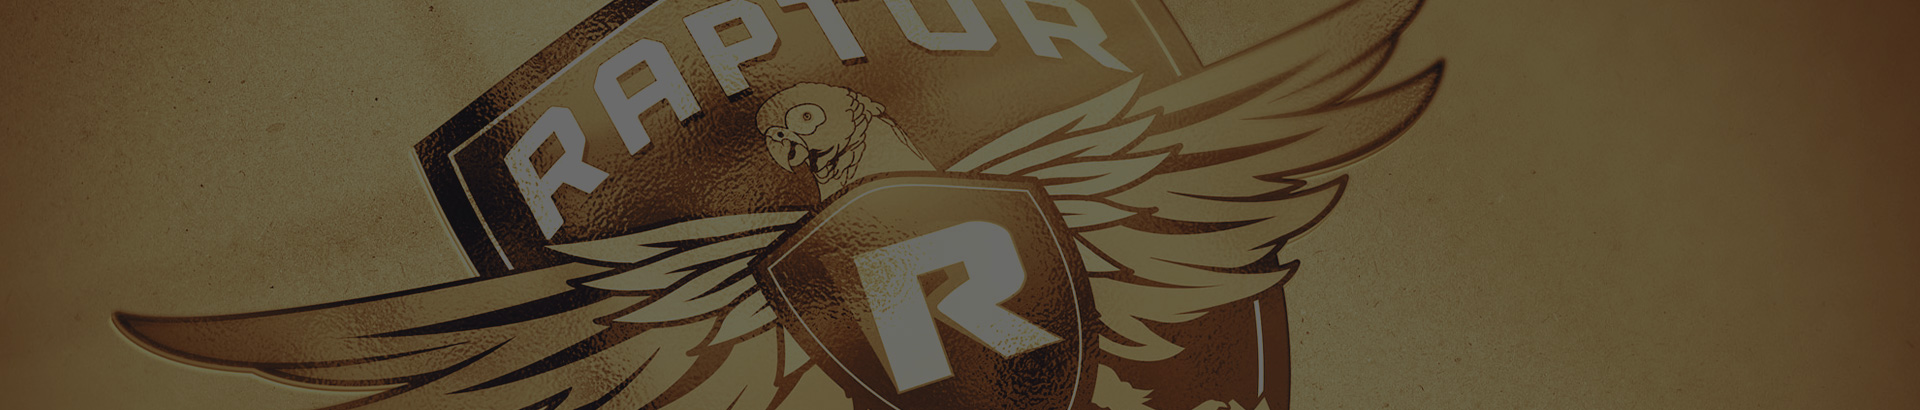 Raptor Mining's 4-Year Journey